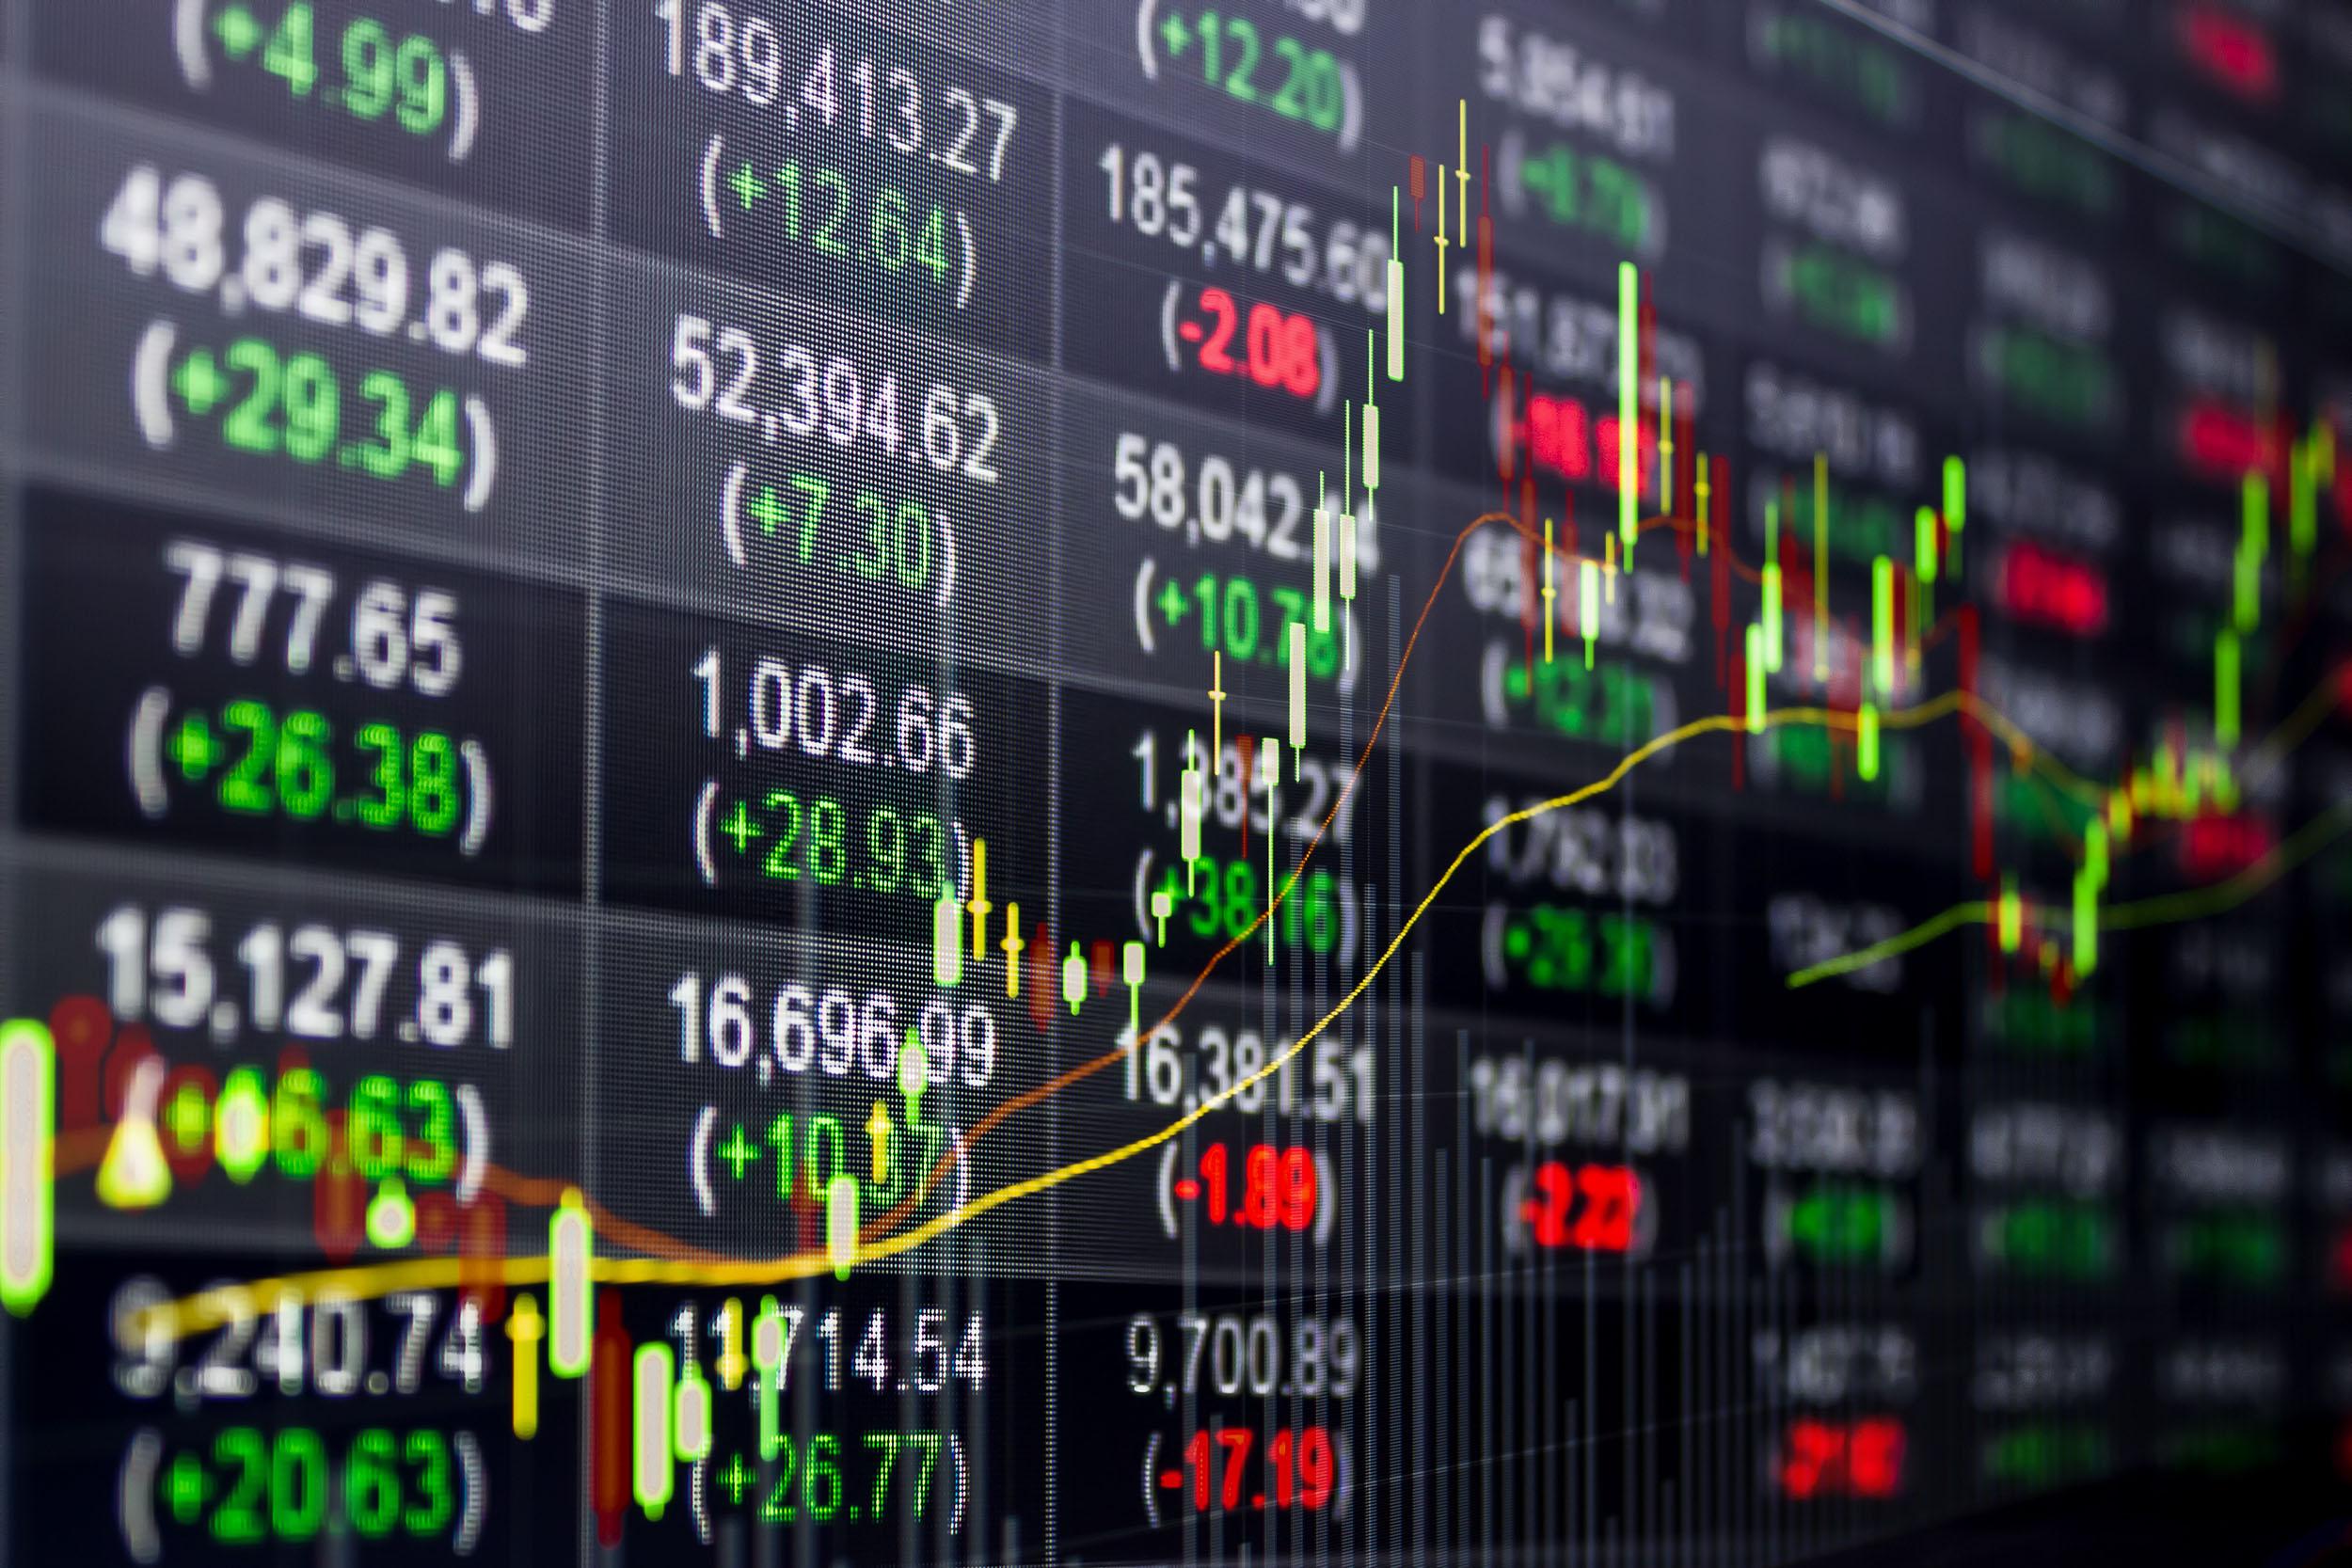 Technical analysis for EURUSD, GBPUSD and USDJPY